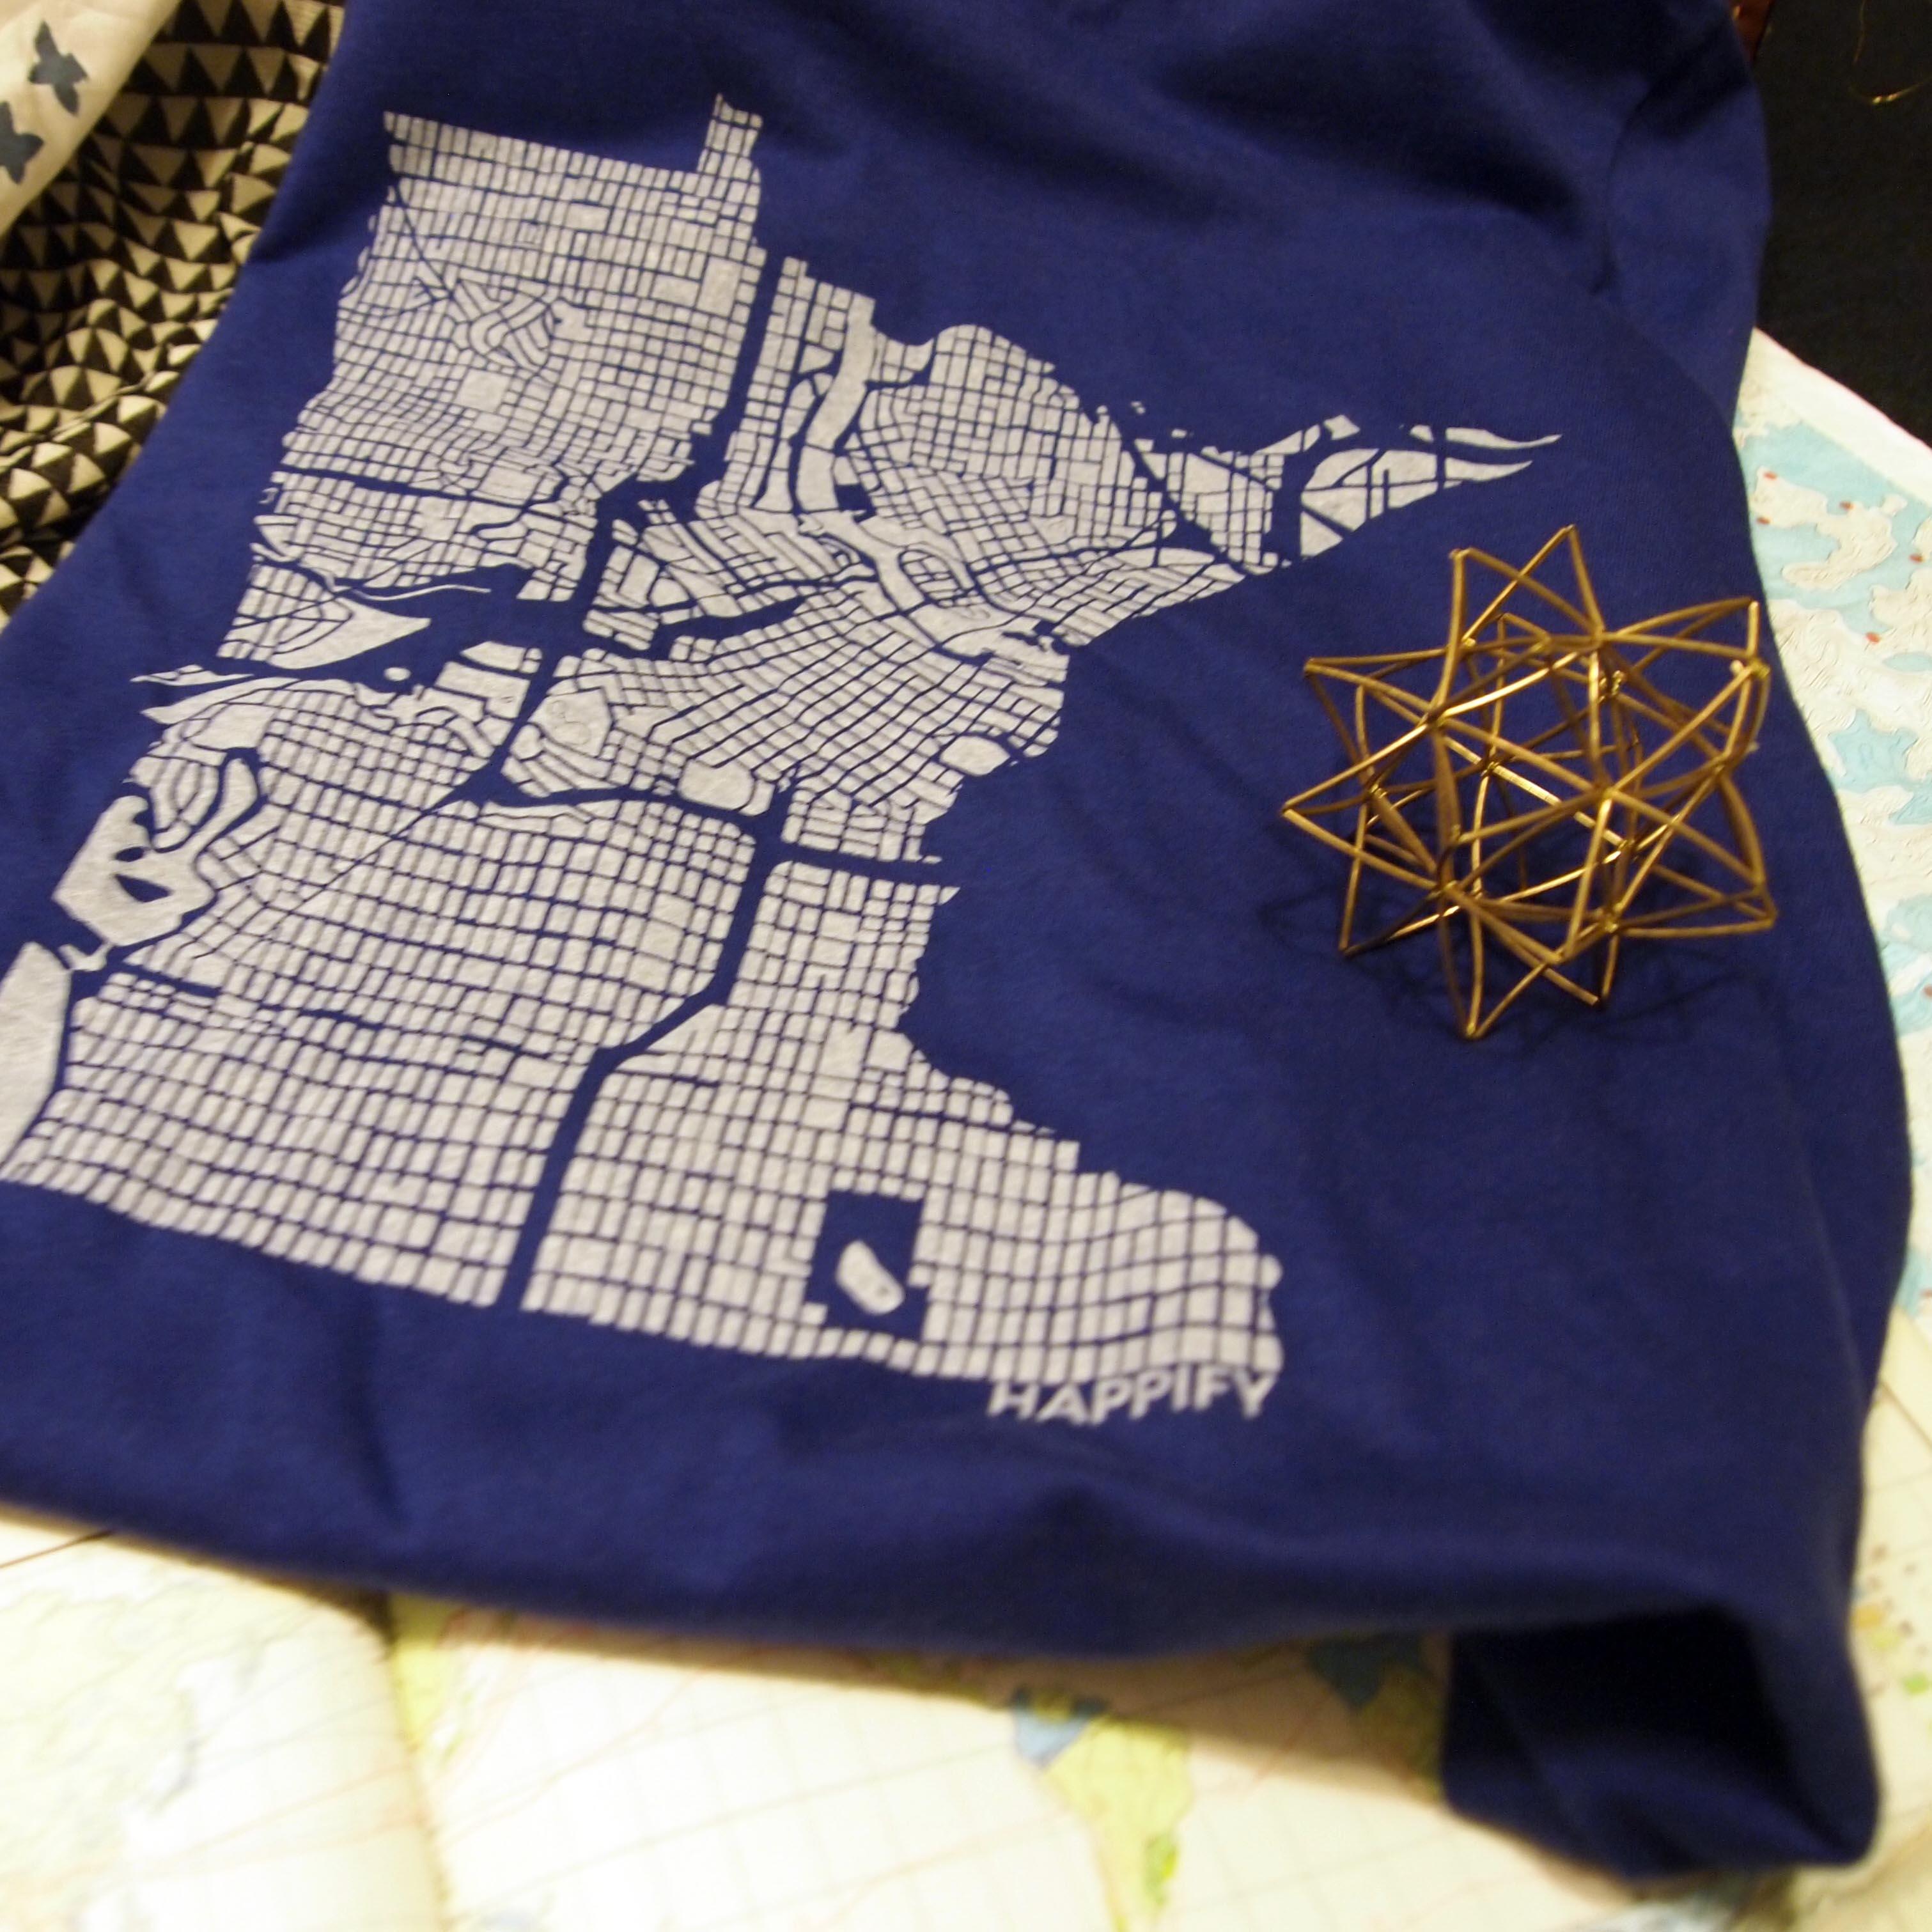 Designed Mplsmn Shirt Happify